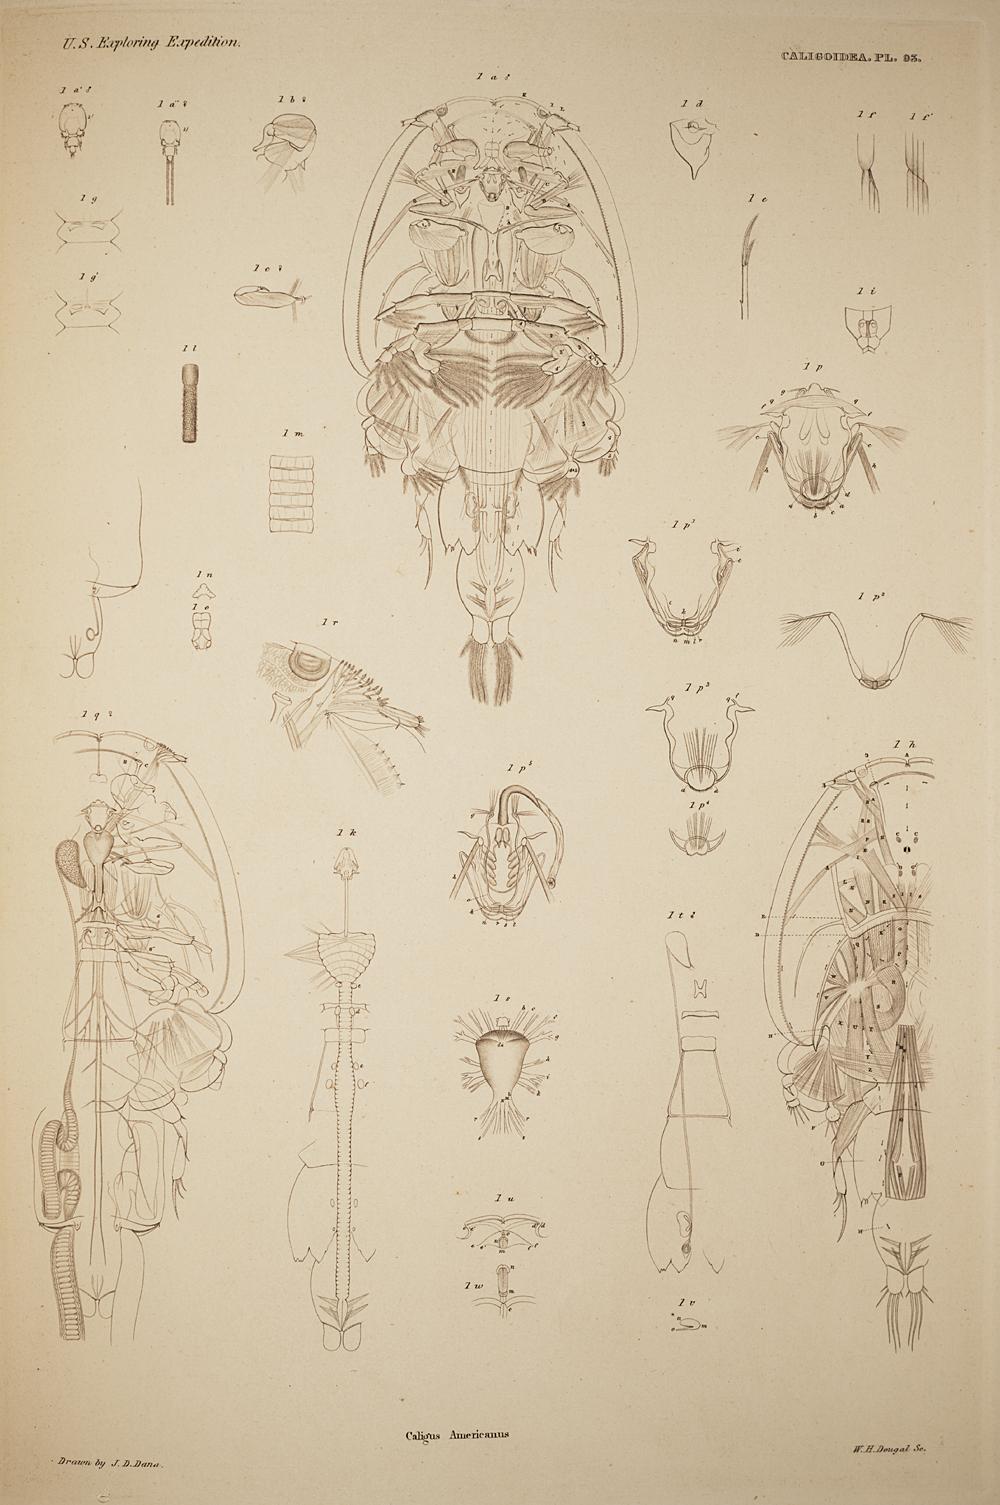 Caligoidea. Pl. 93,  Image number:SIL19-21-219b